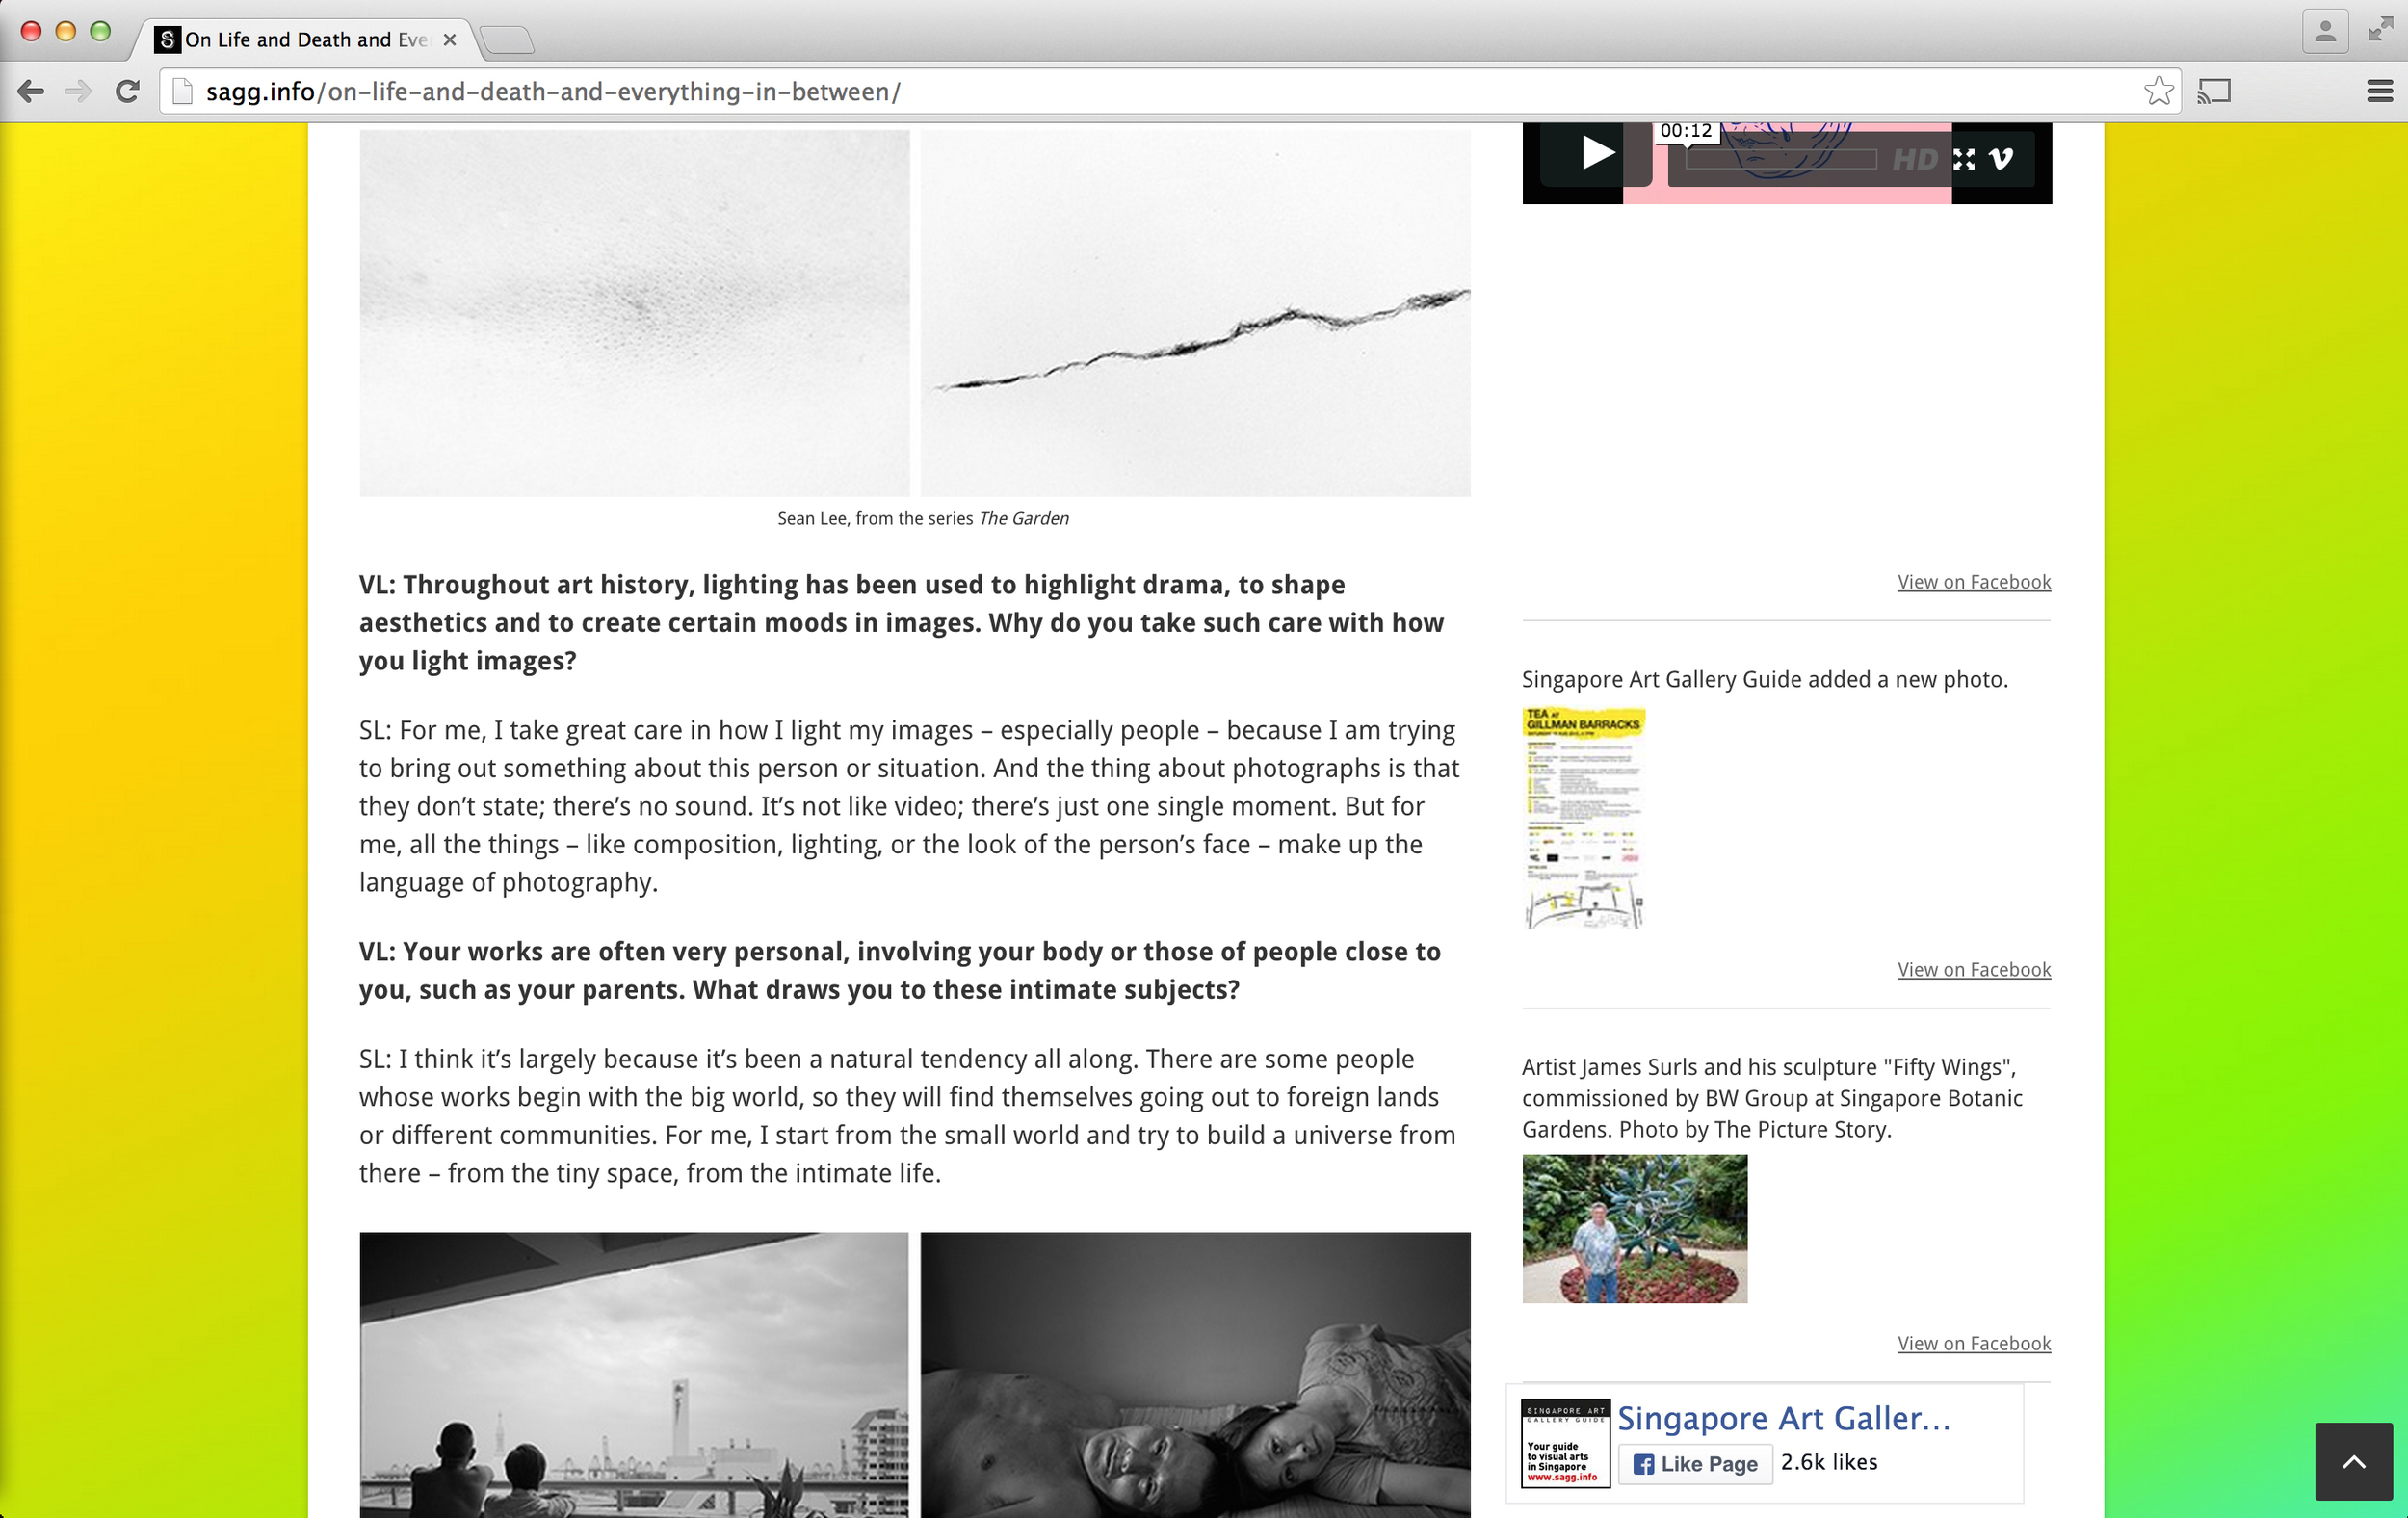 Screenshot 2015-09-05 00.05.46-ed.jpg